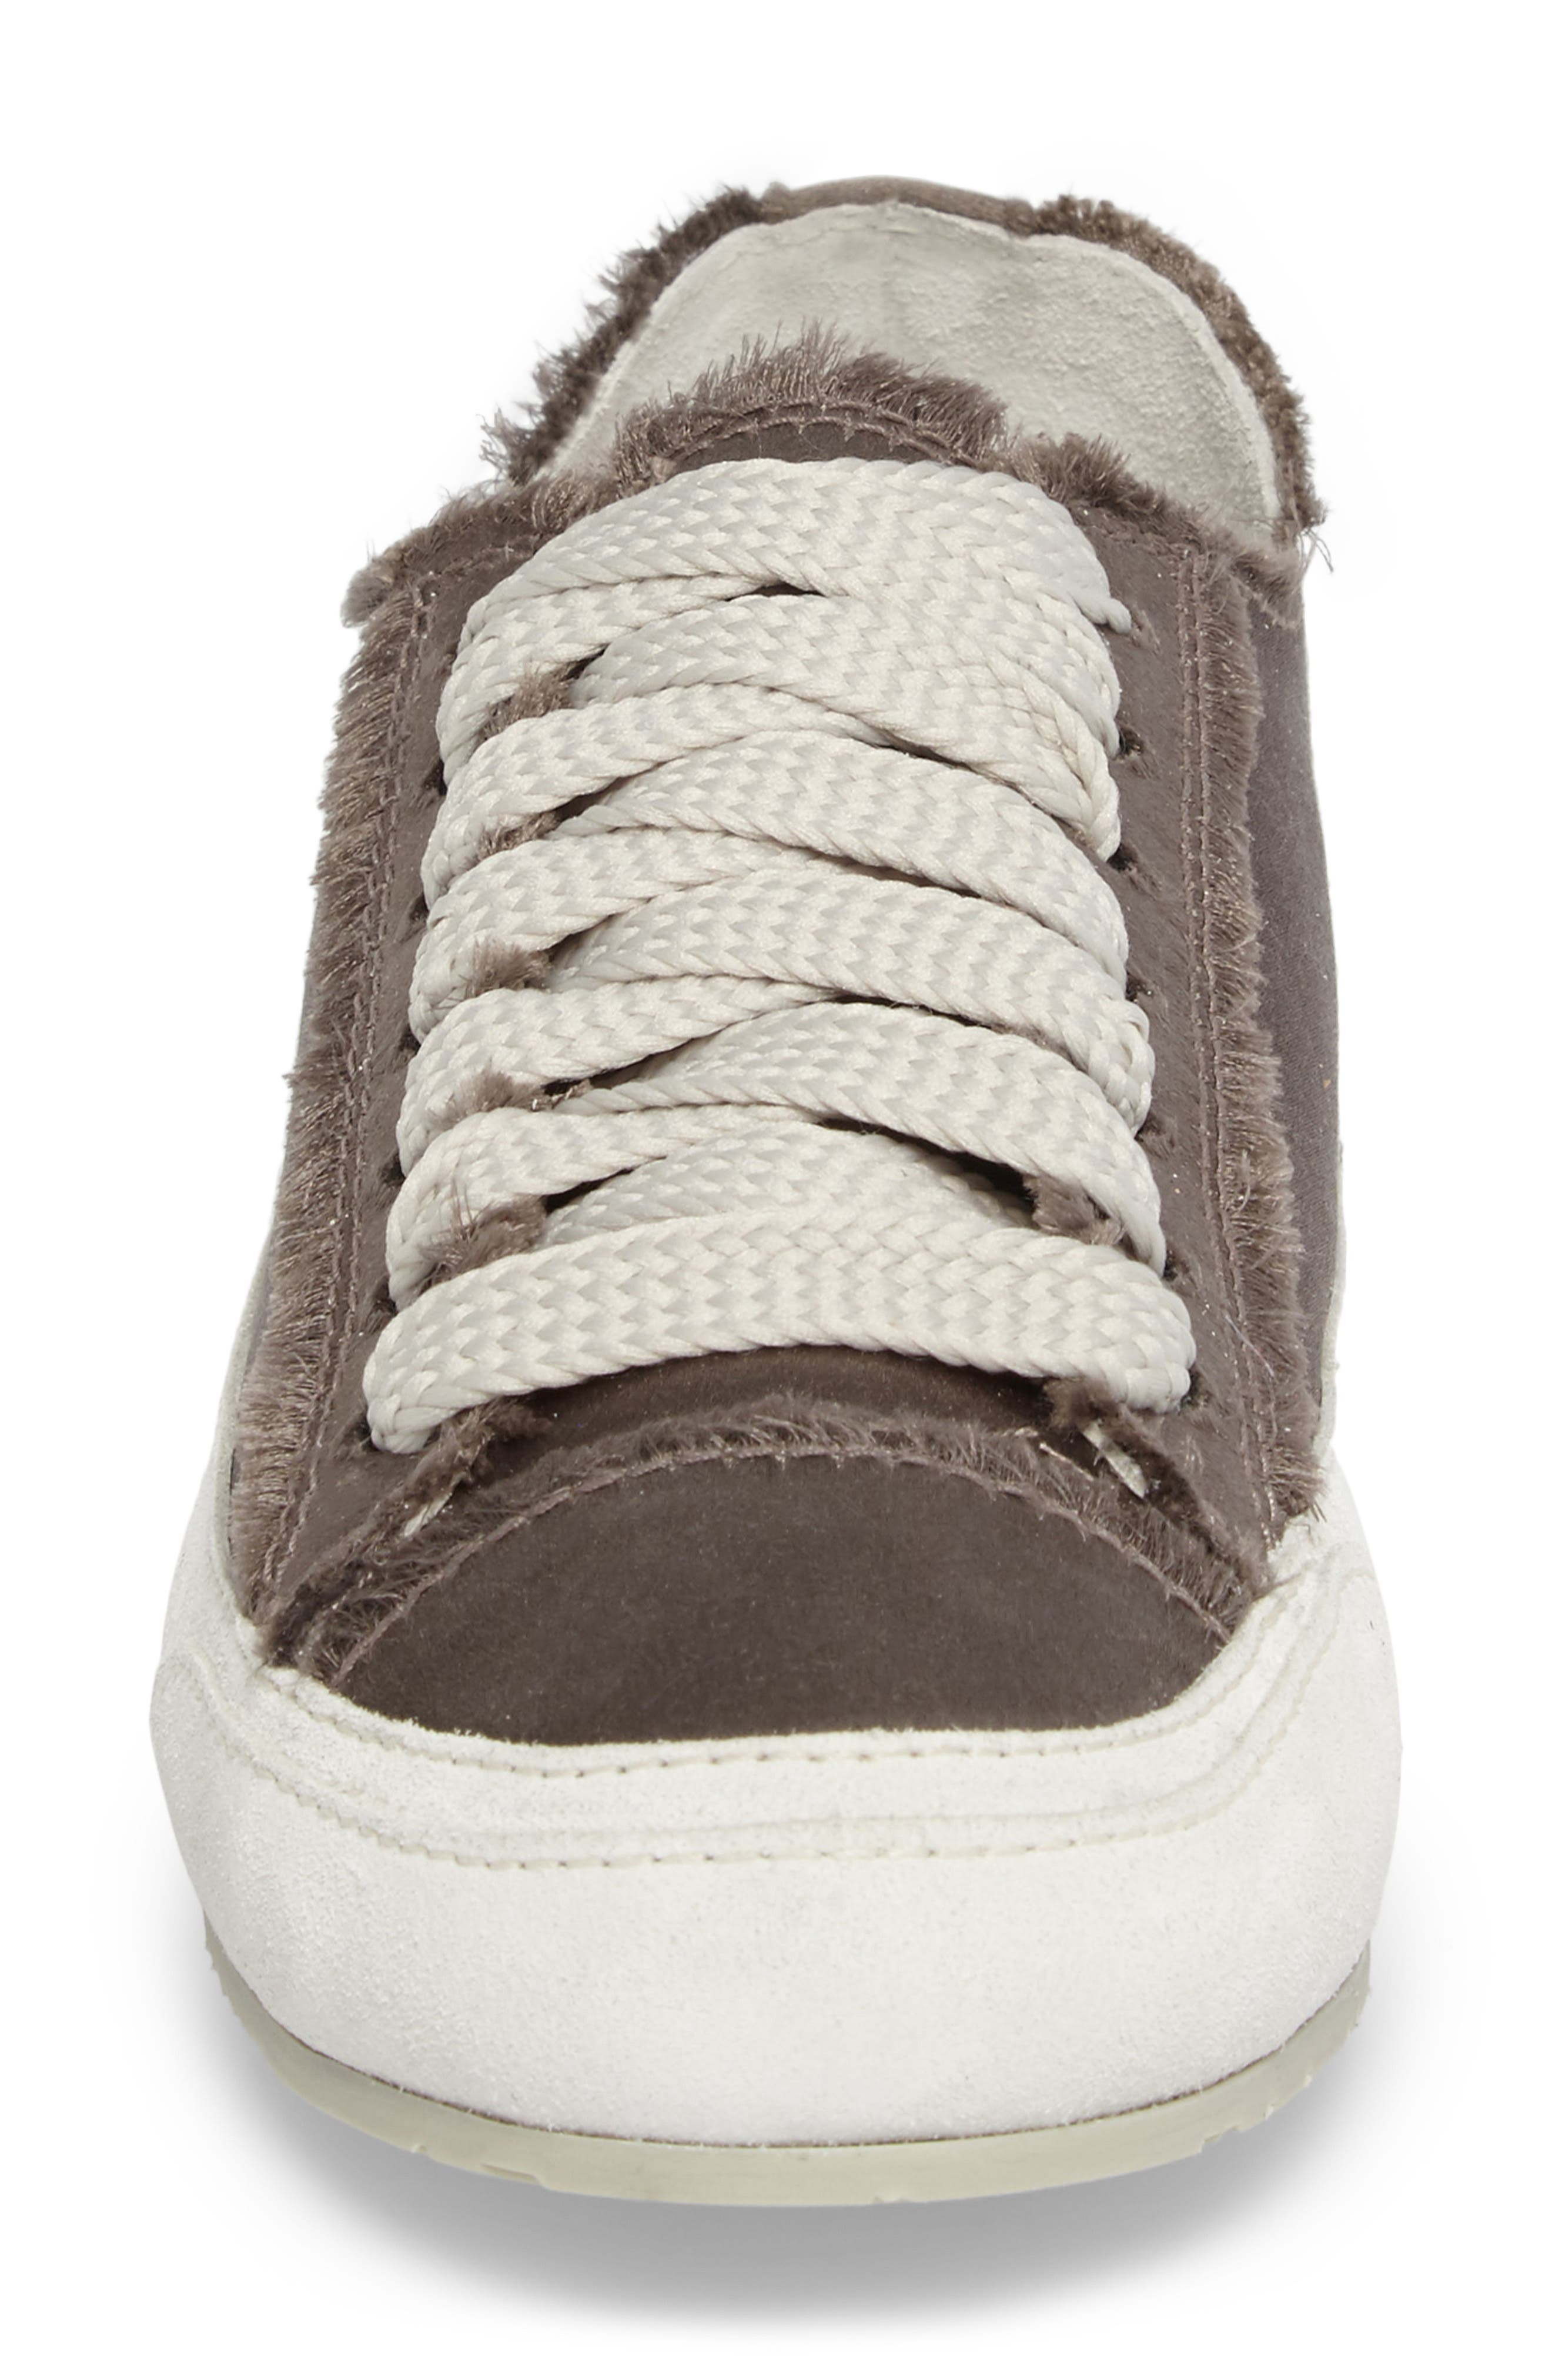 'Parson' Satin Sneaker,                             Alternate thumbnail 3, color,                             Truffle Satin